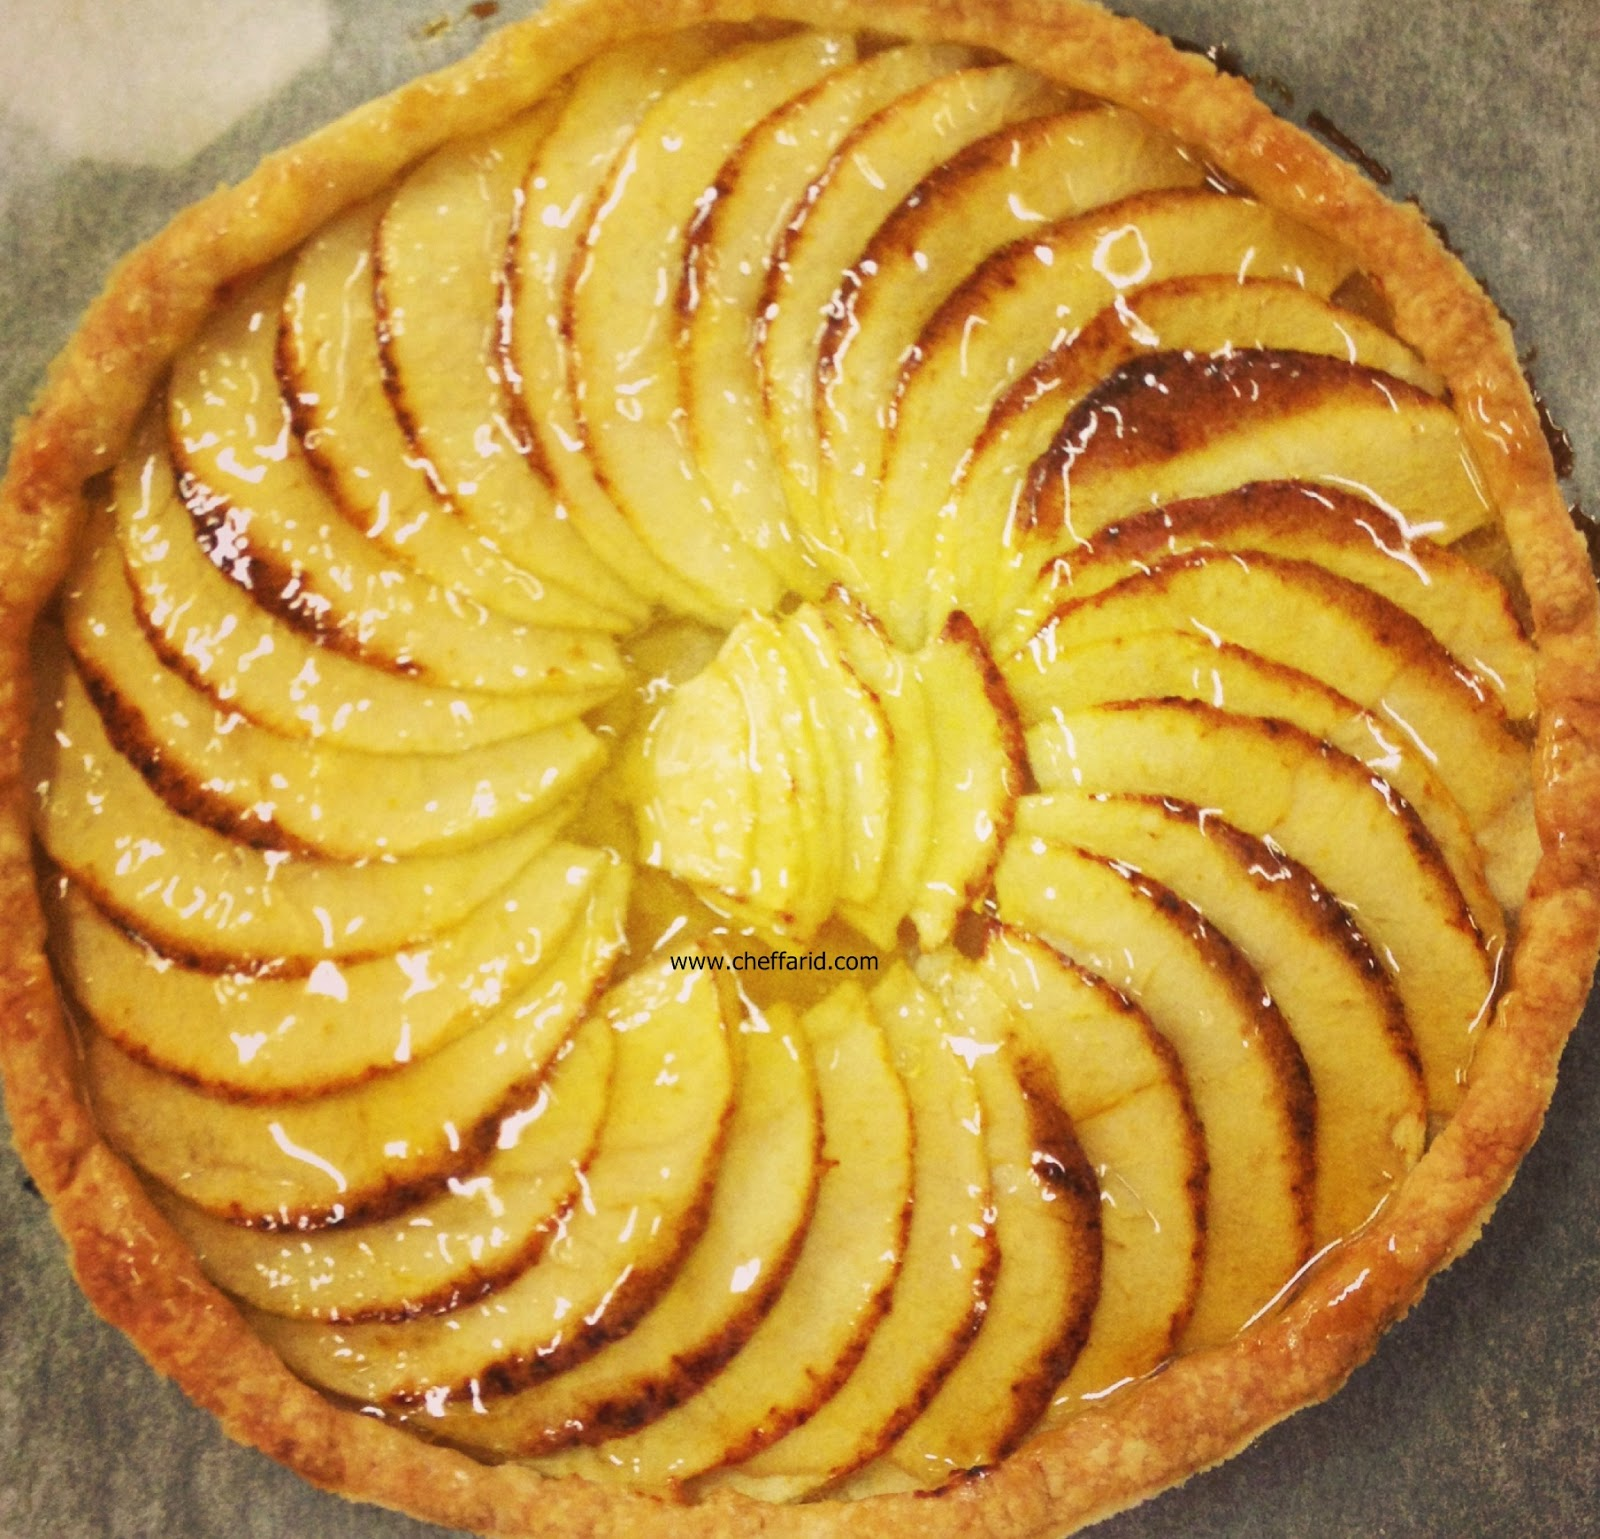 How to make french Apple tart   cheffarid